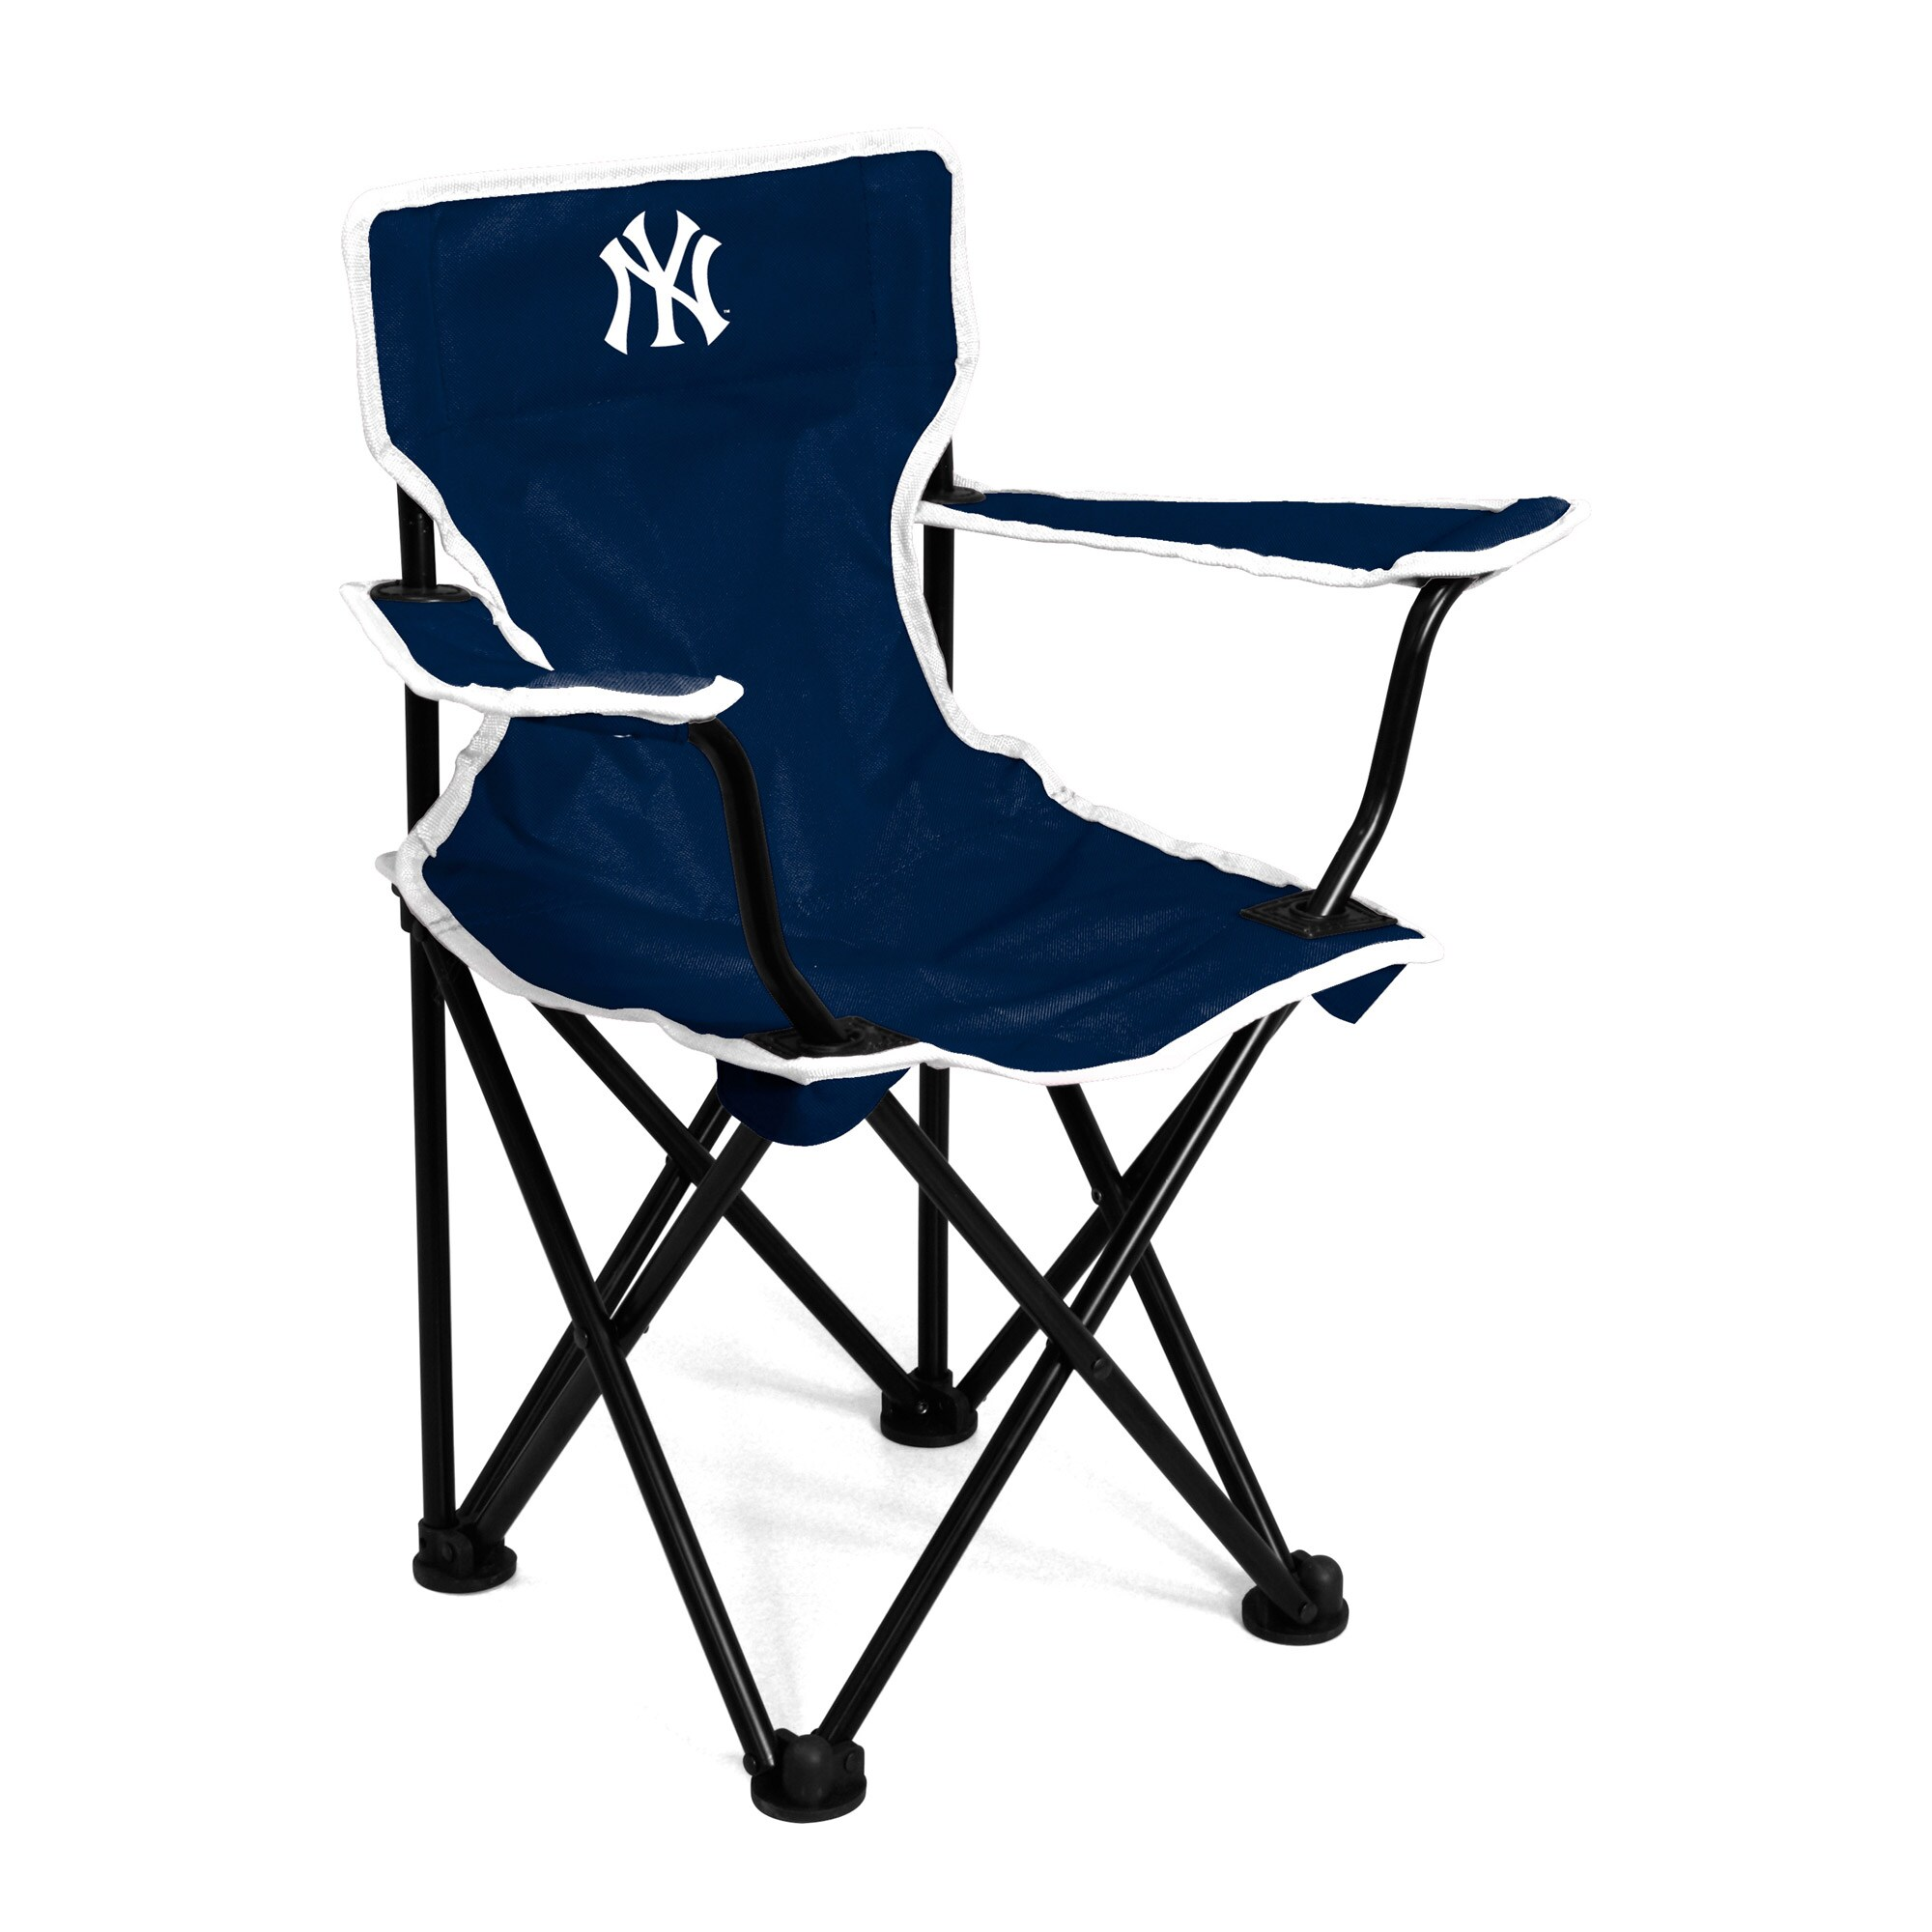 New York Yankees Toddler Chair